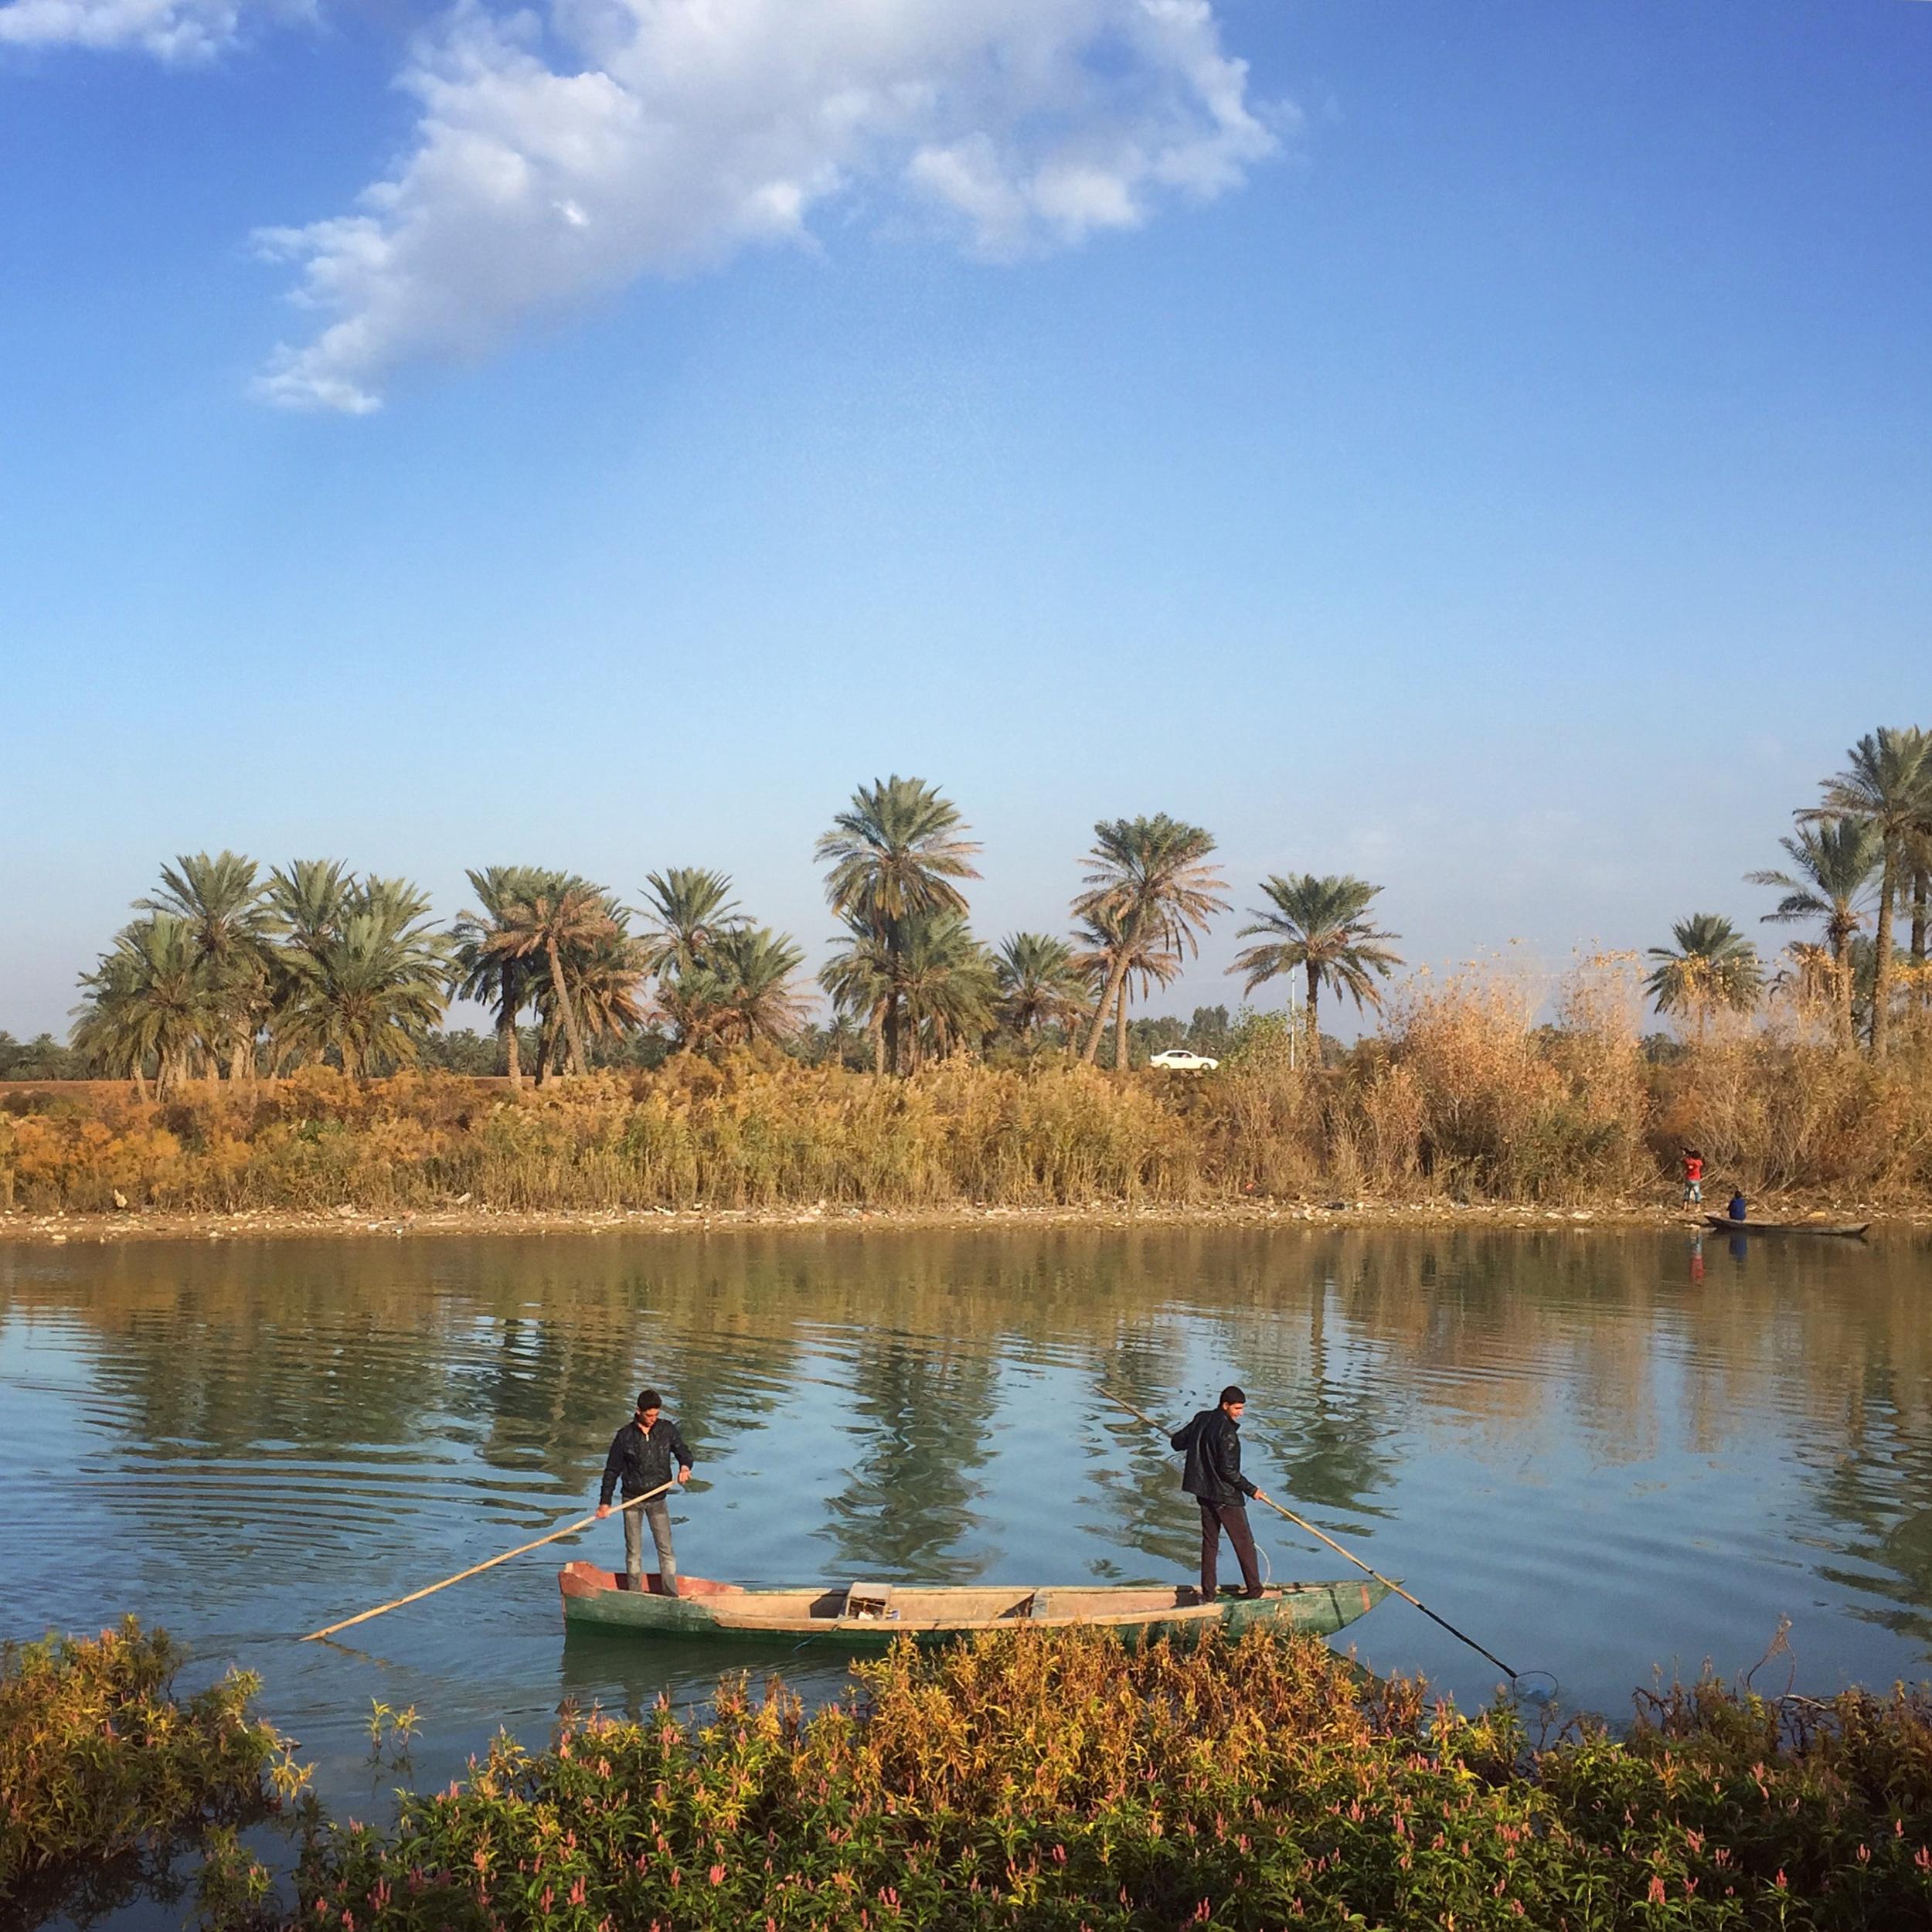 Fishermen in Shatt al- Amarah, one of the Tigris River's branches, go electrofishing with a mini generator in their canoe, in Amarah, Maiysan, Iraq. (Ahmad Mousa)